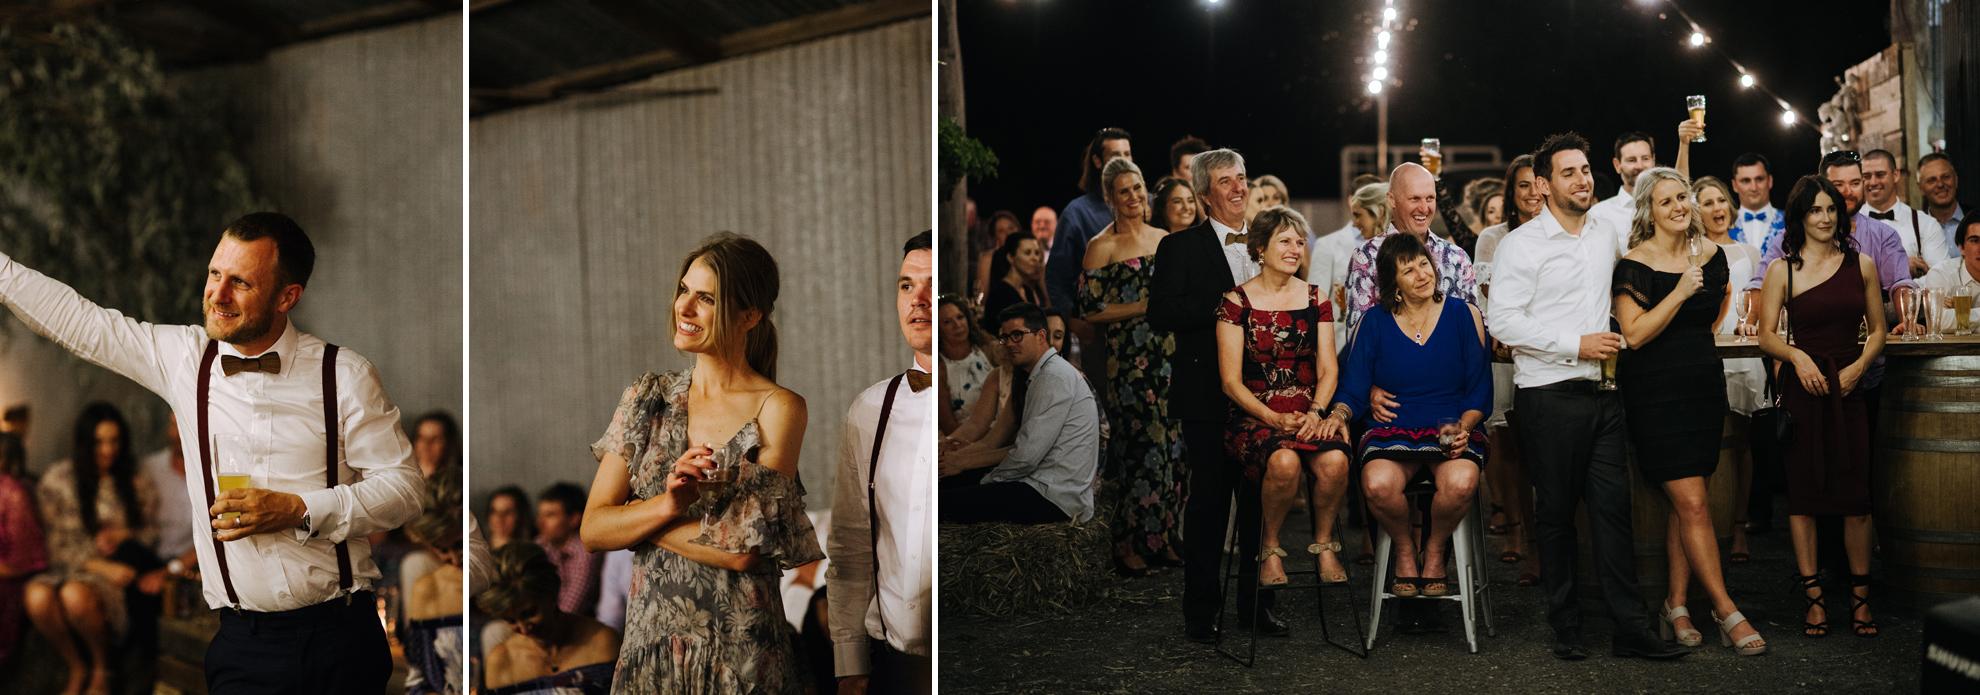 108-Jason_Jessie_Dalby_Country_Wedding.jpg